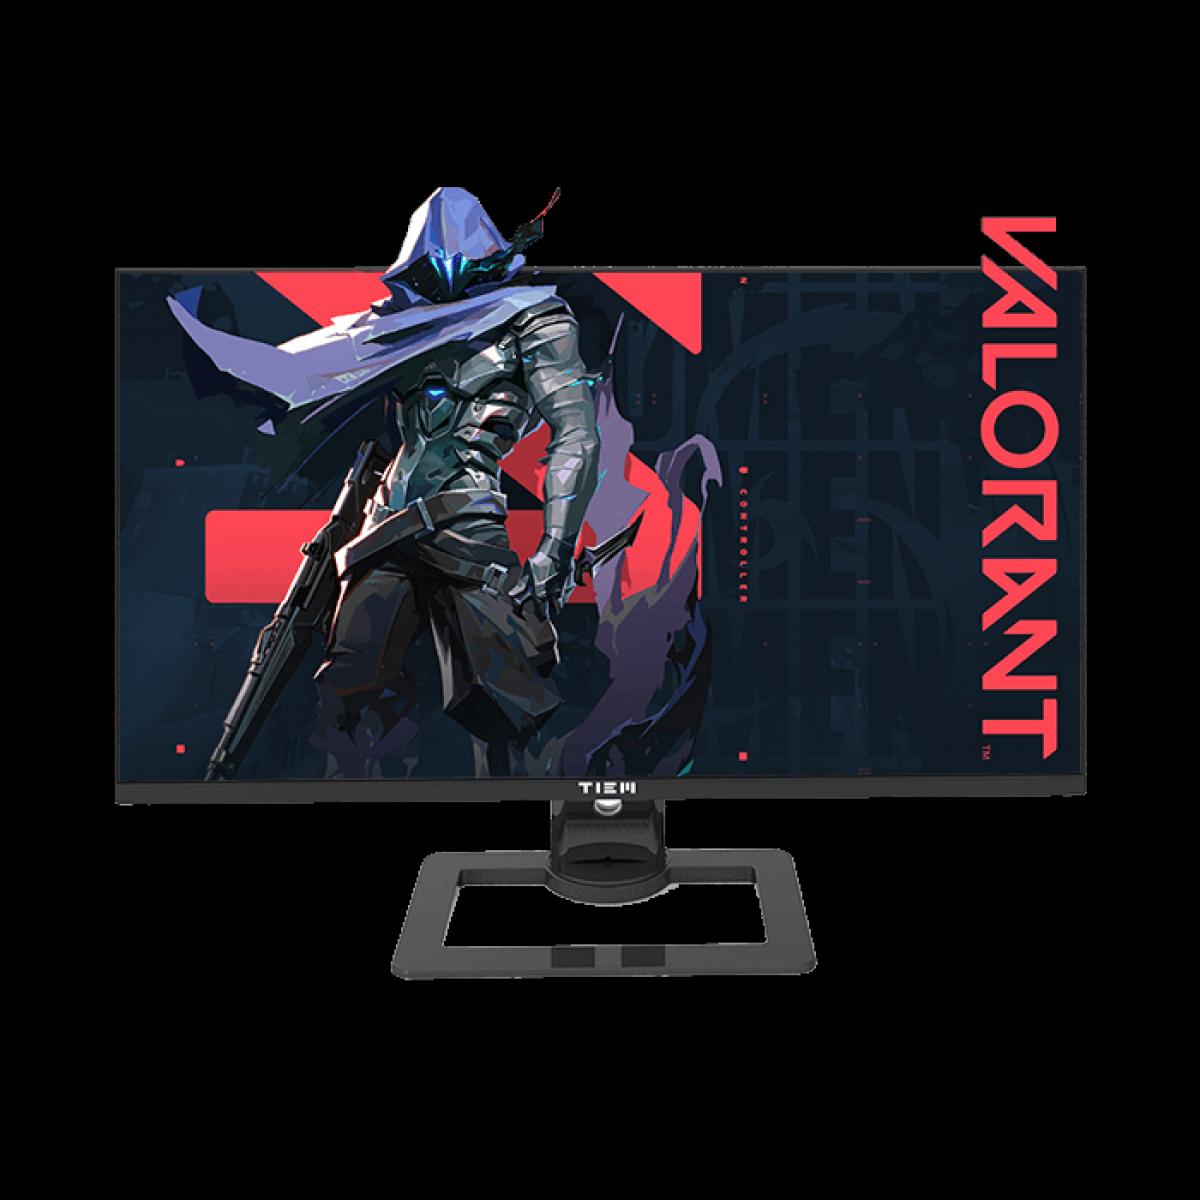 Monitor Gamer TIEM, 27 Pol, Full HD, 1Ms, 144Hz, HDMI/DP, 27P+